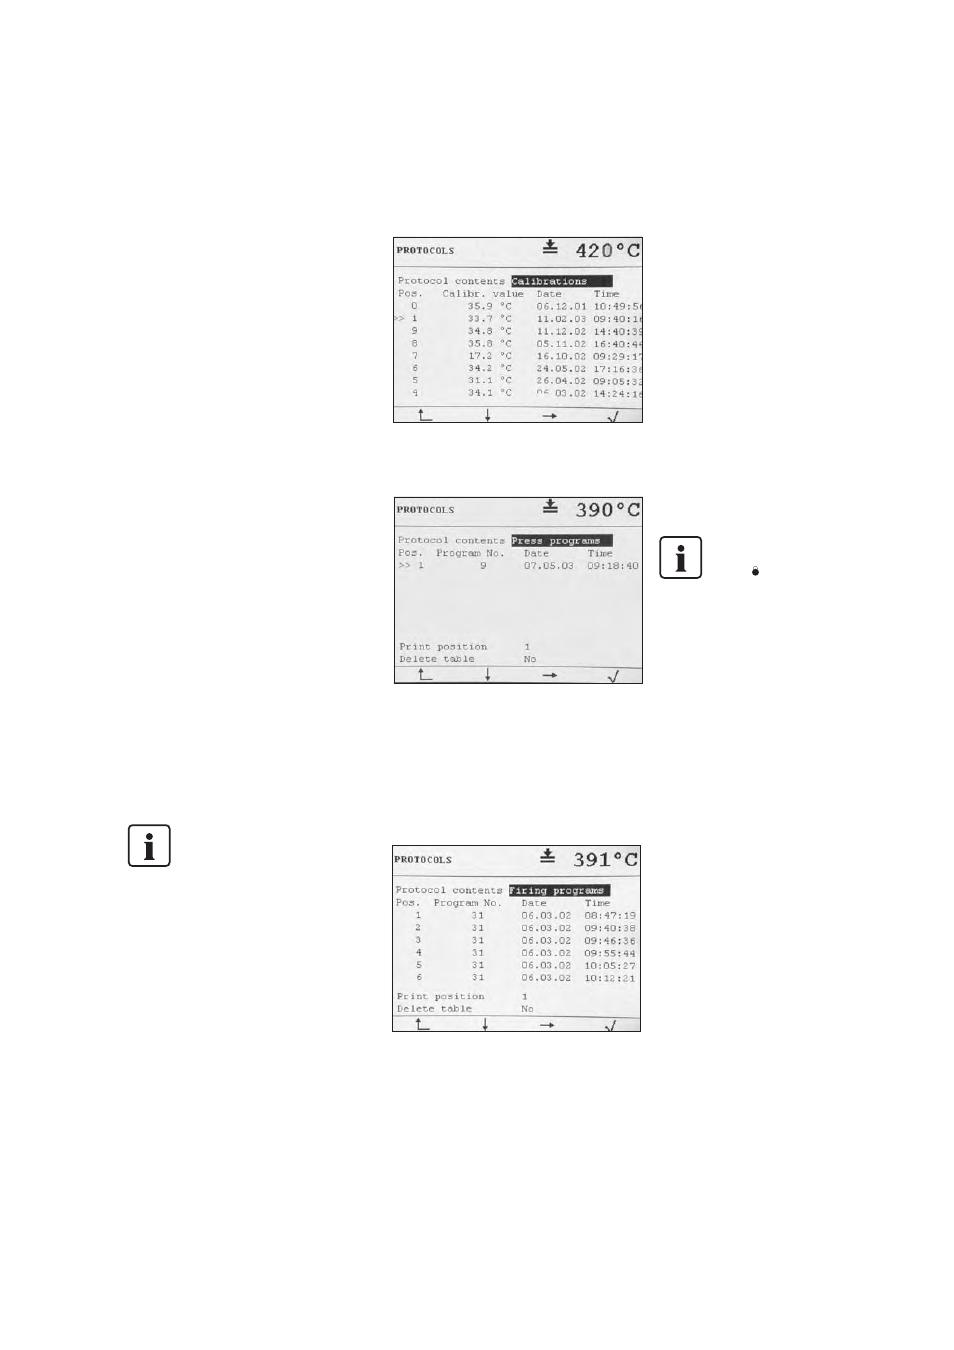 ivoclar vivadent ep 600 combi user manual page 24 40 rh manualsdir com